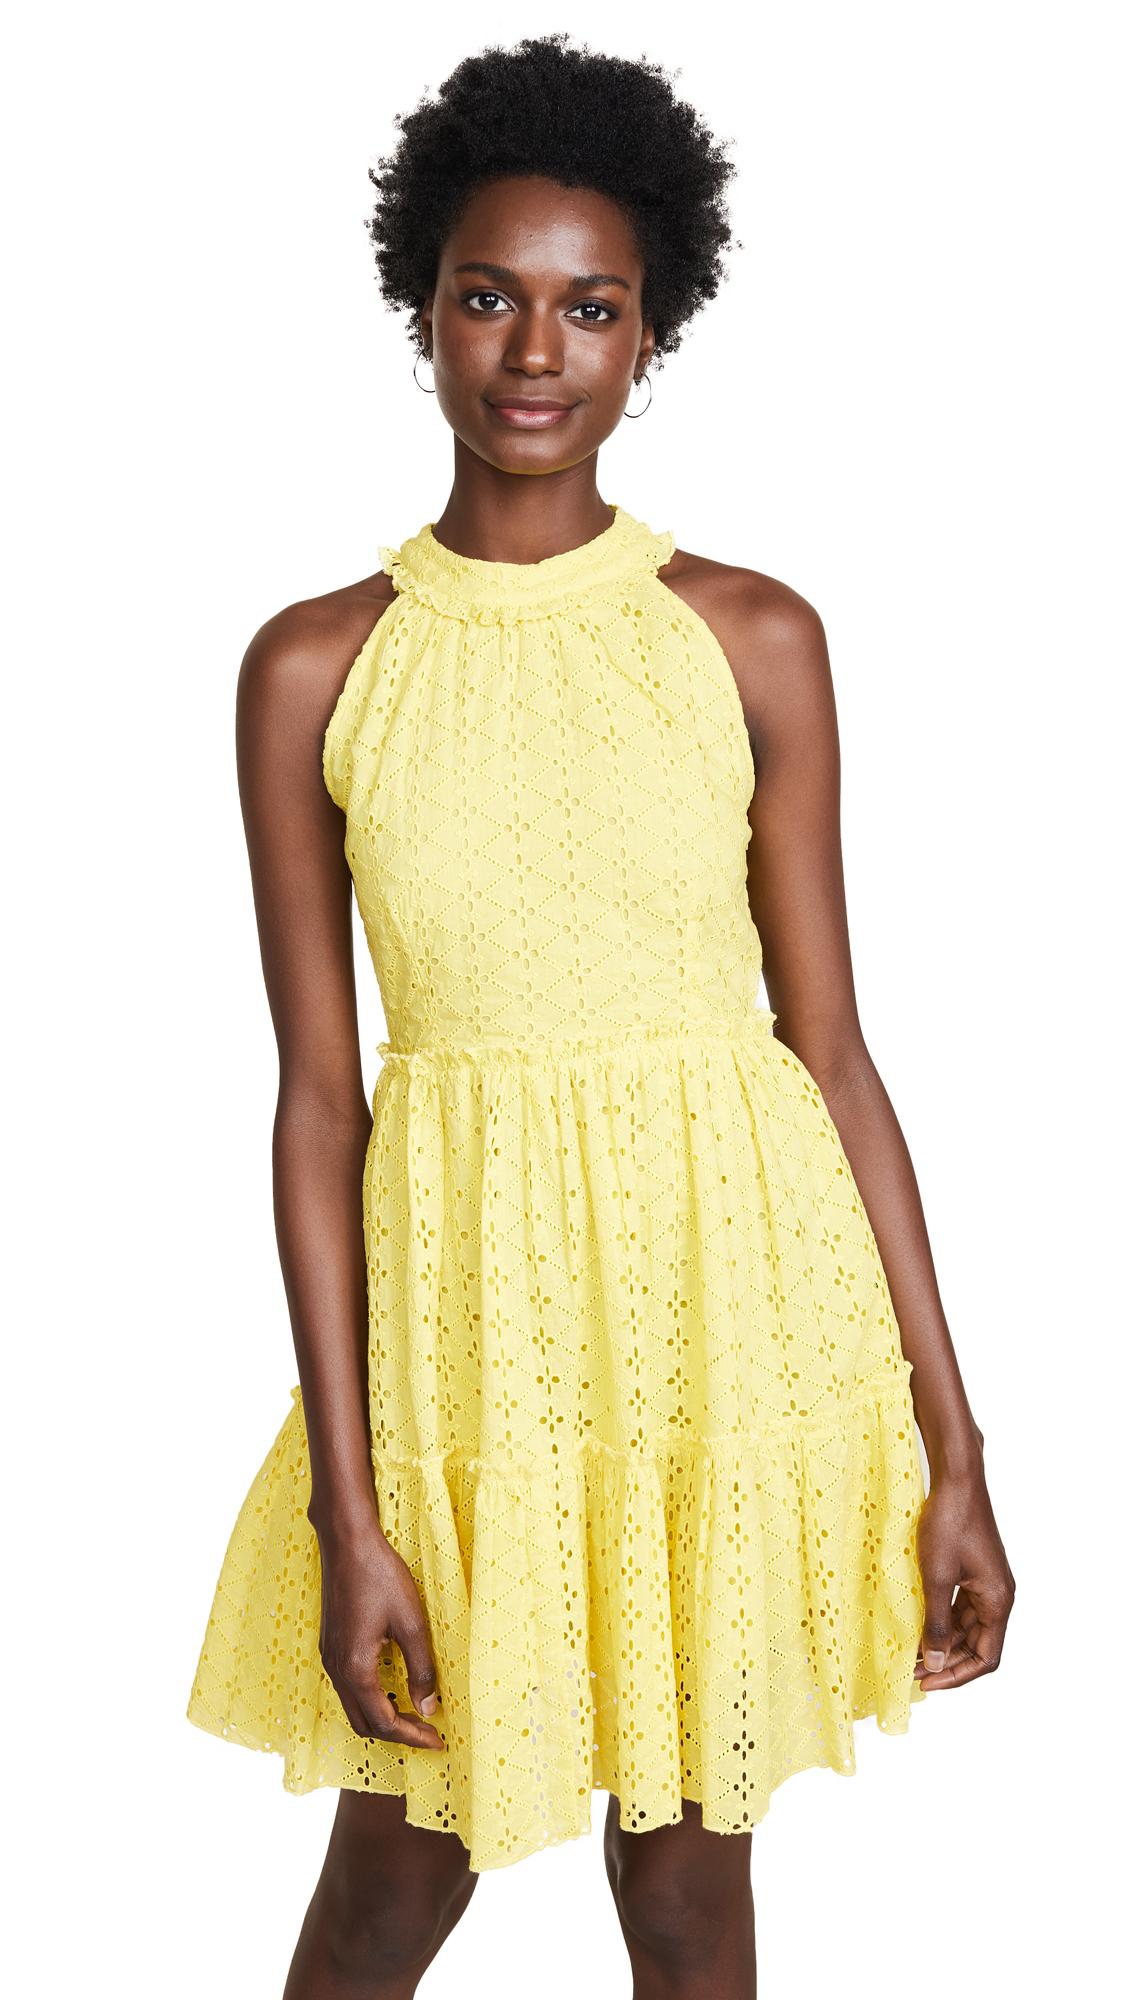 VALENCIA & VINE Penny Dress in Yellow